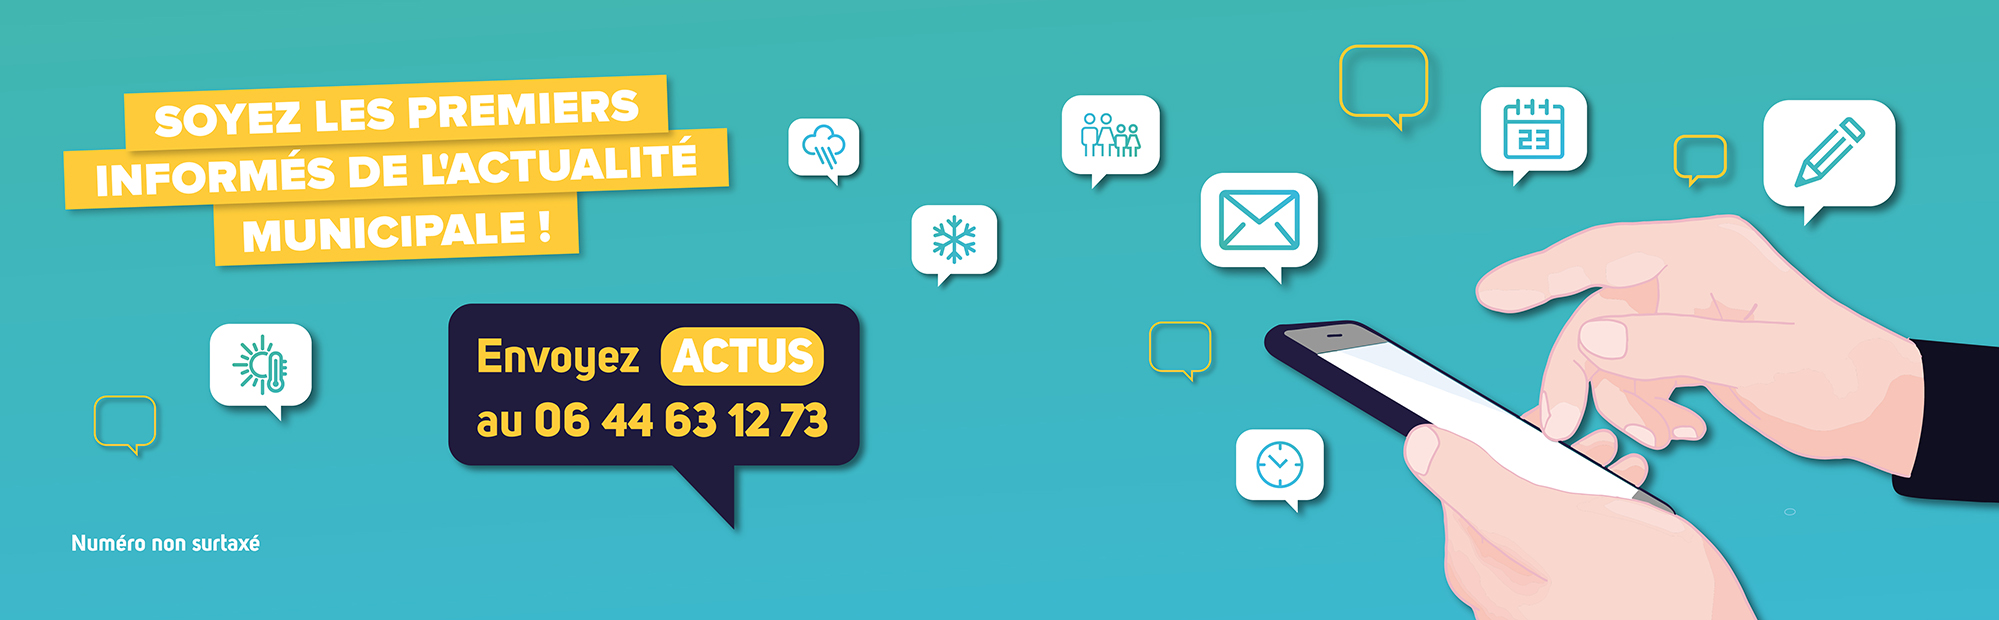 SMS : En un mot, toute l'info